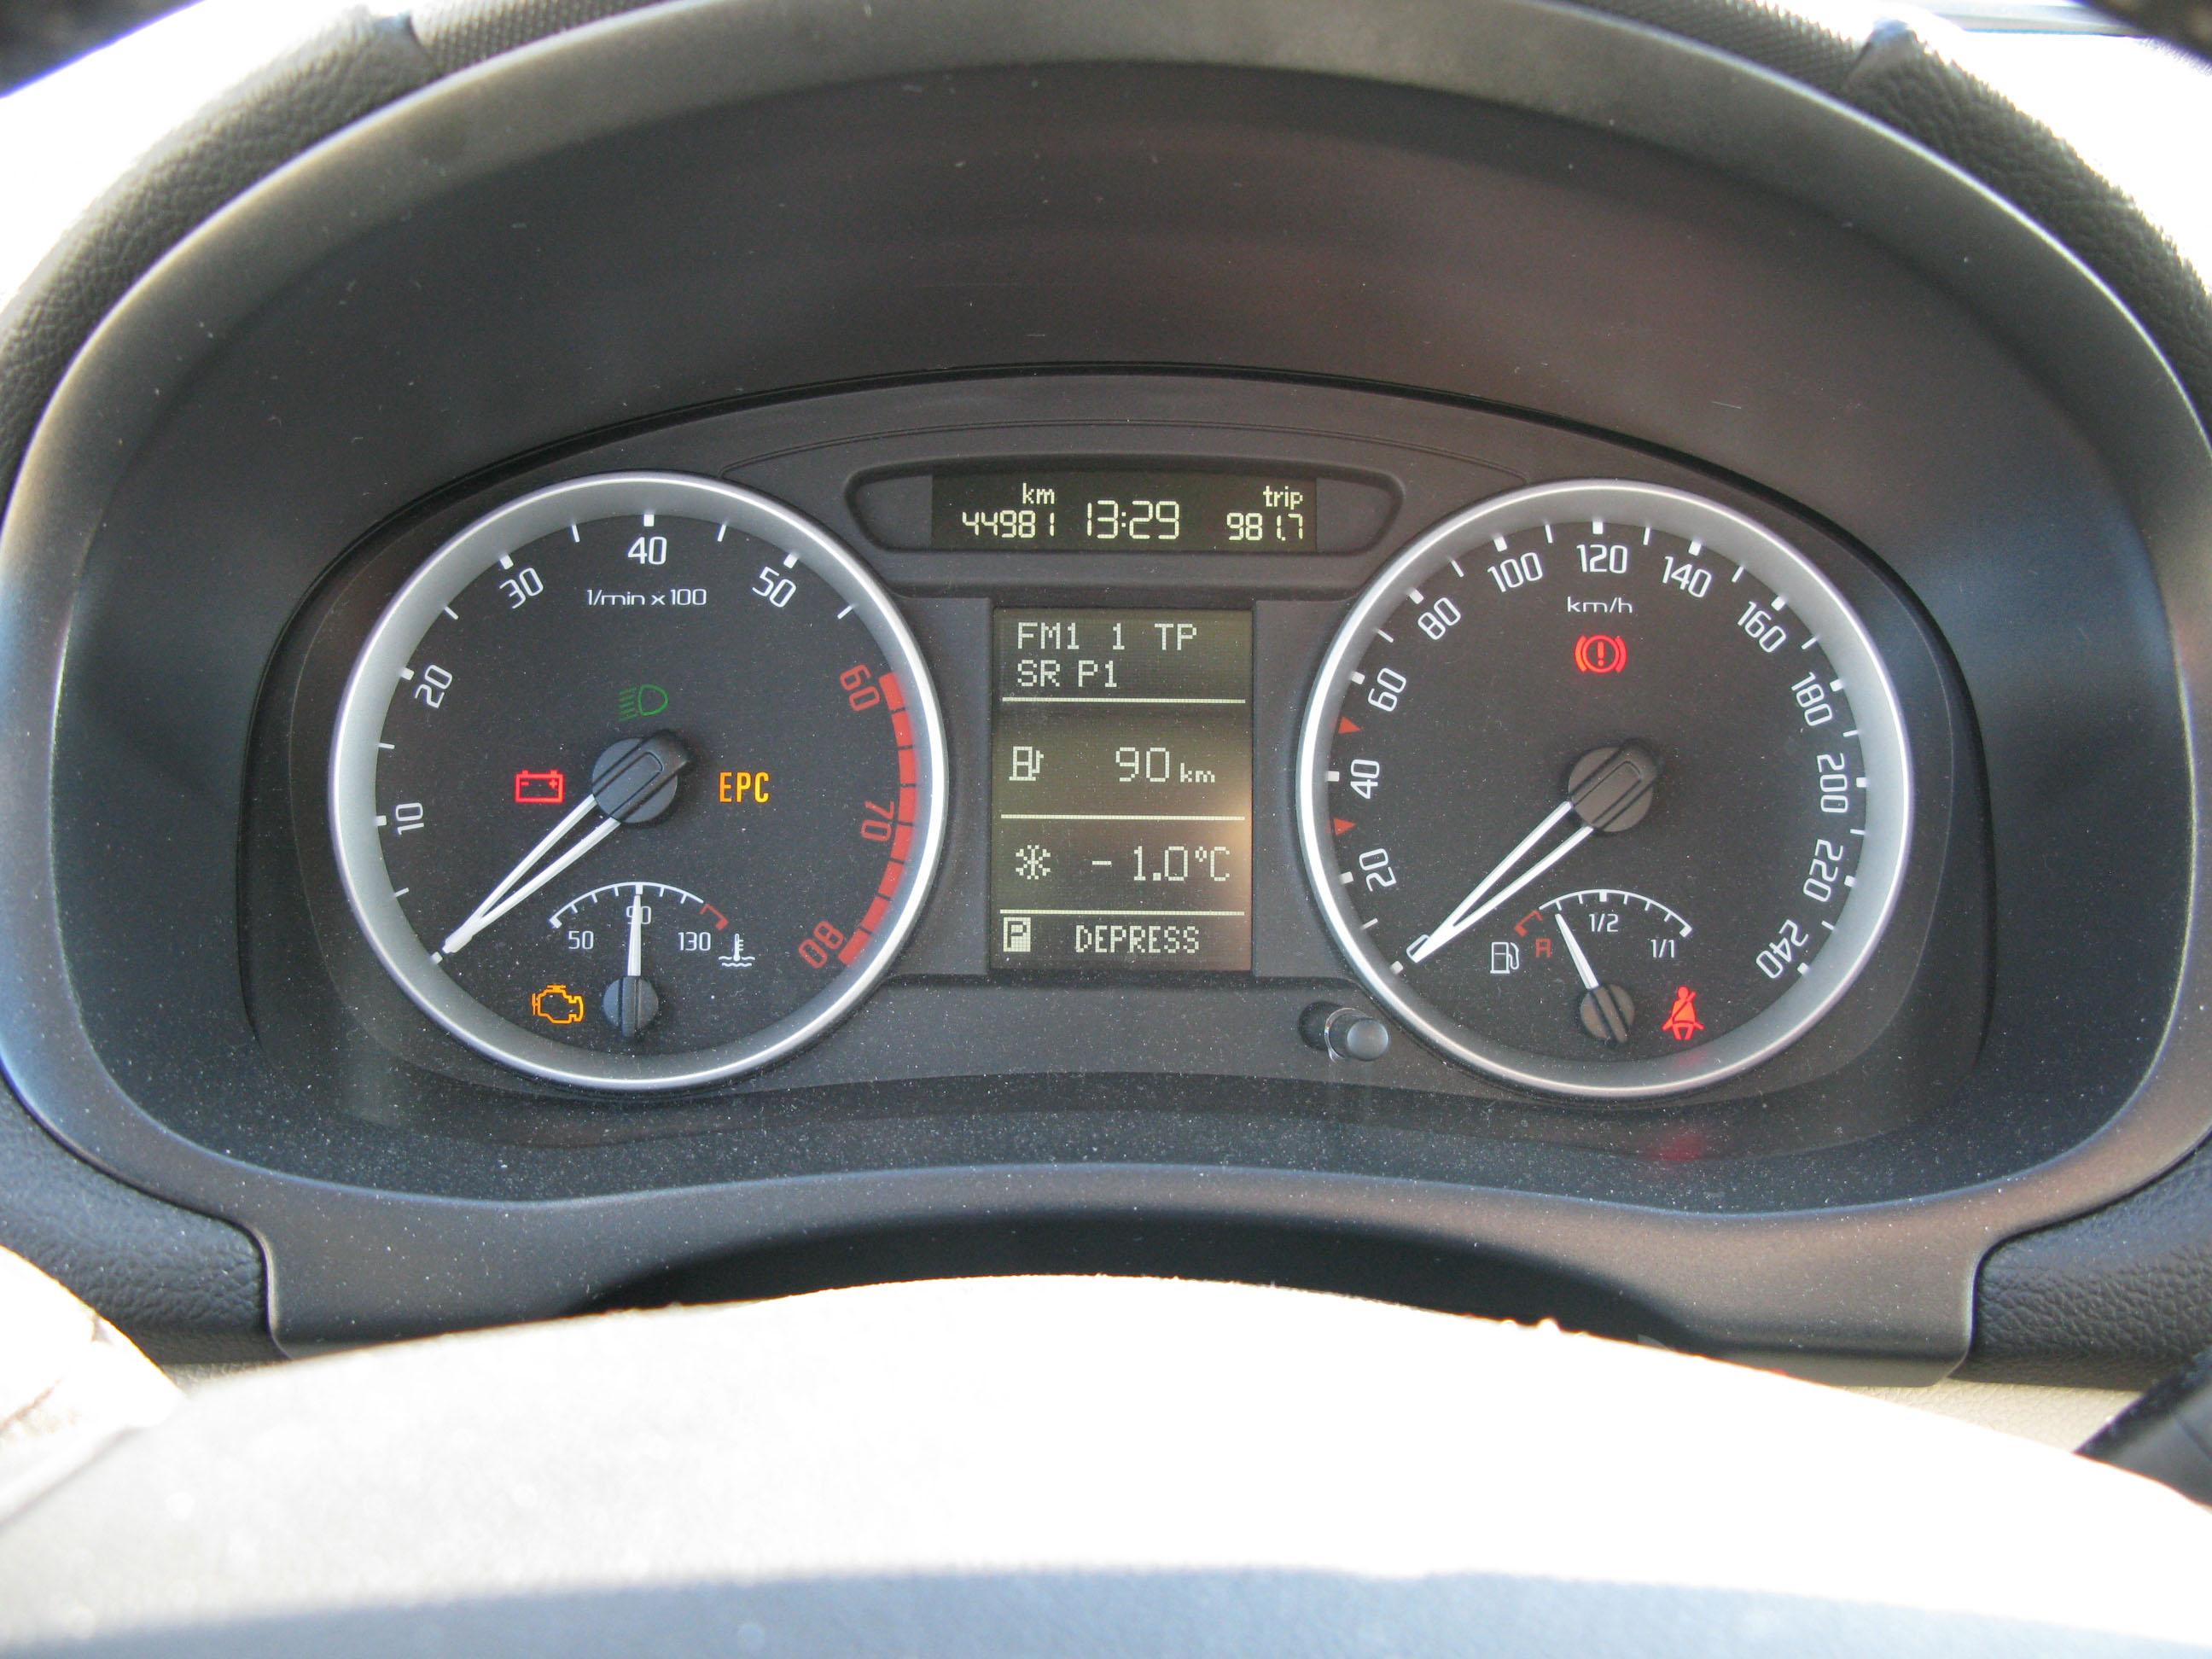 File:Skoda Fabia 2 gauges jpg - Wikimedia Commons